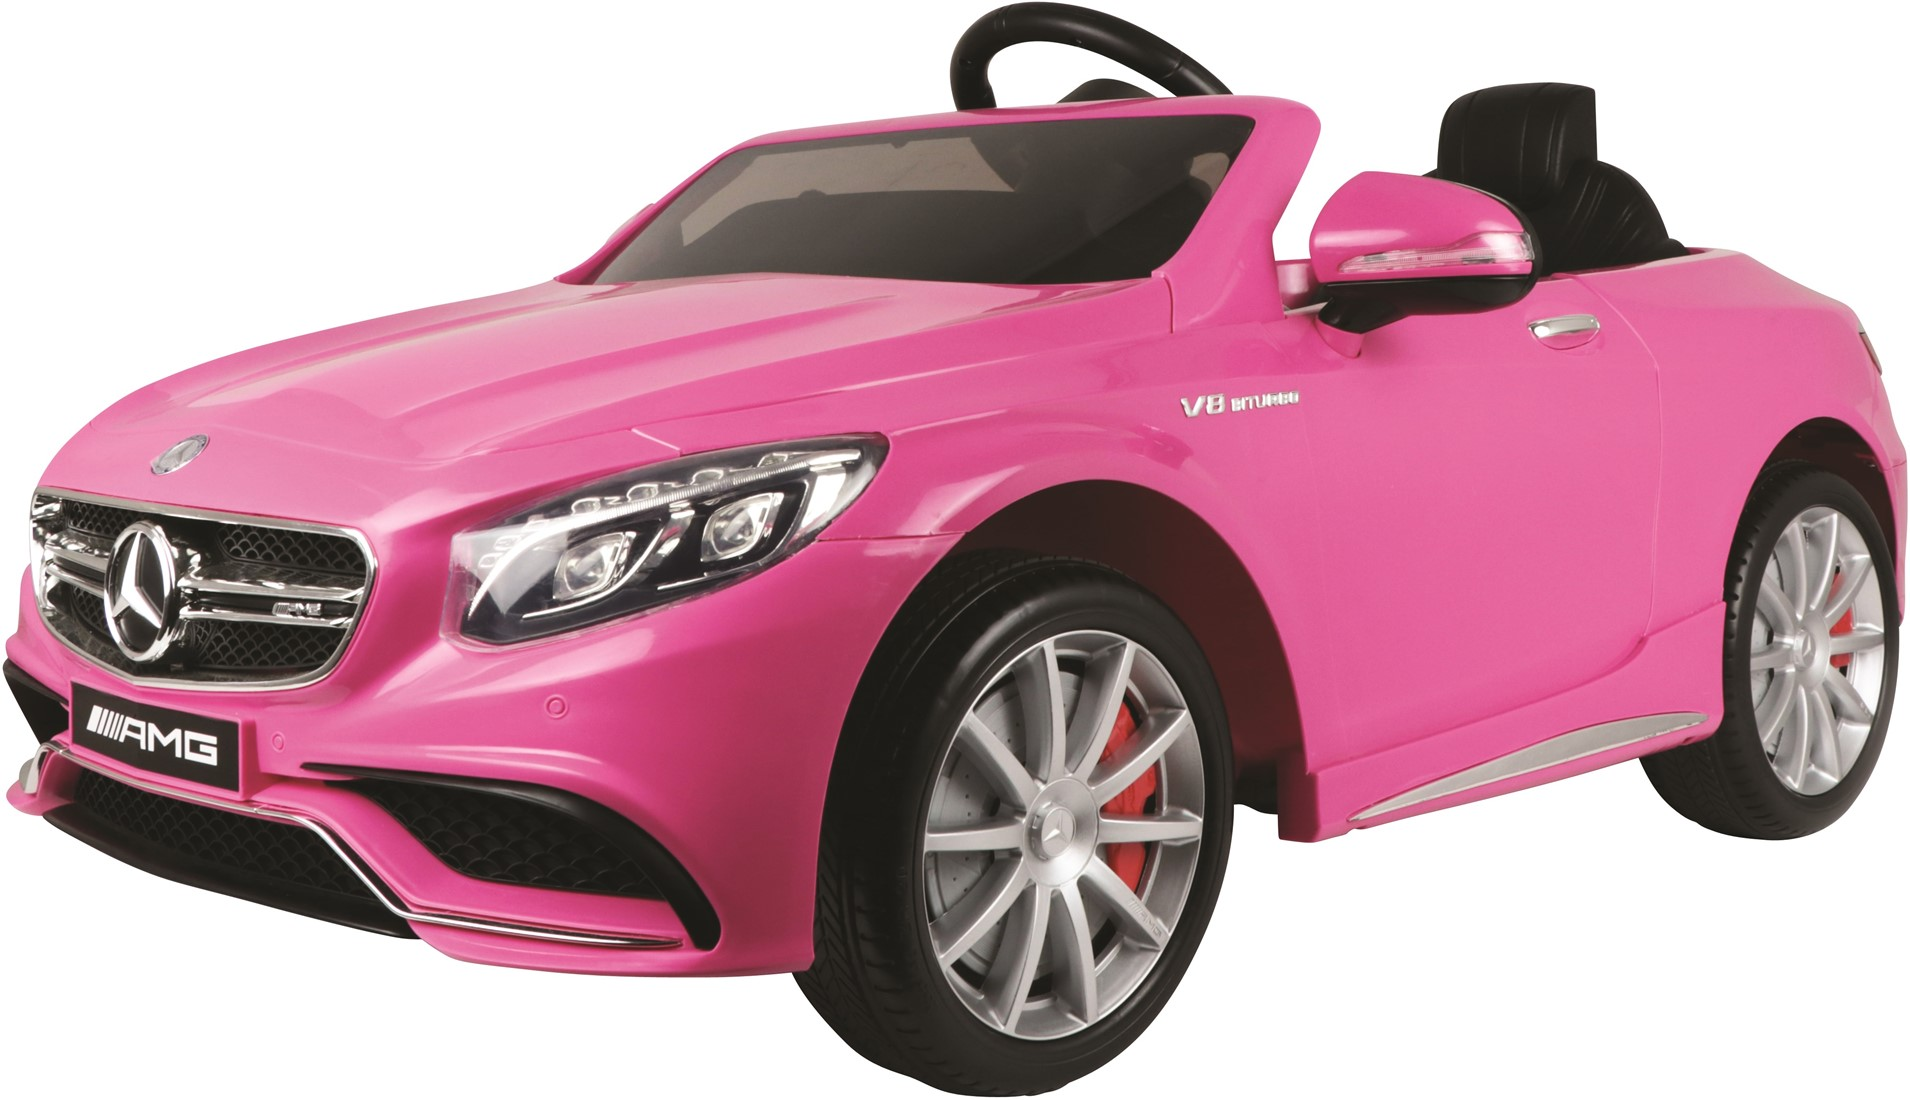 Afbeelding van E car mercedes benz s63 amg roze